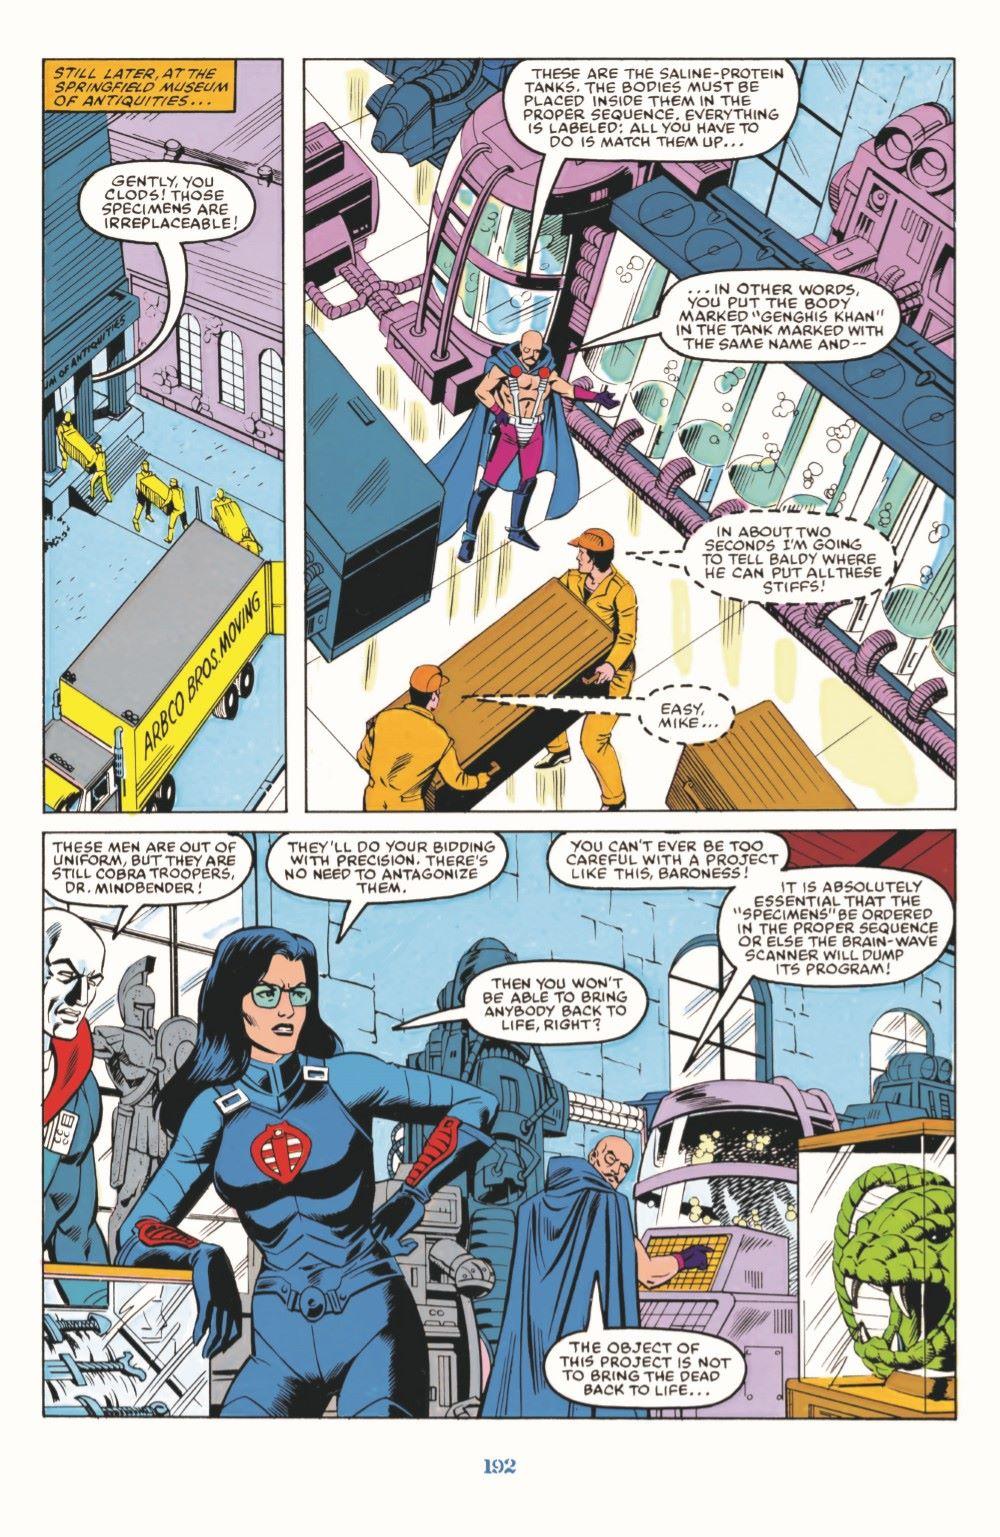 GIJoeRAH_SerpentorUncoiled-pr-07 ComicList Previews: G.I. JOE A REAL AMERICAN HERO SERPENTOR UNCOILED #1